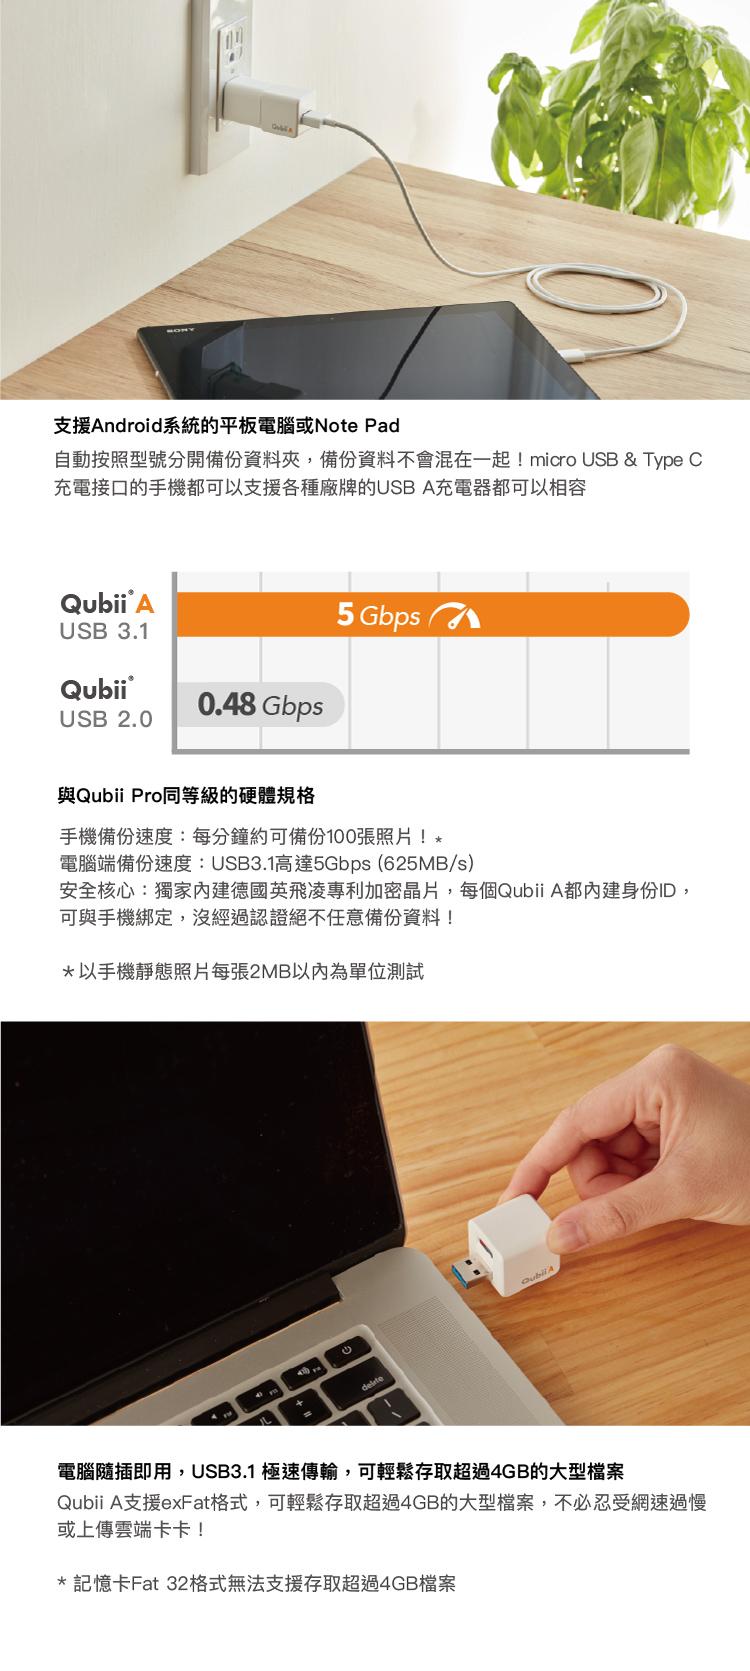 qubii a 備份 豆腐 安卓 版